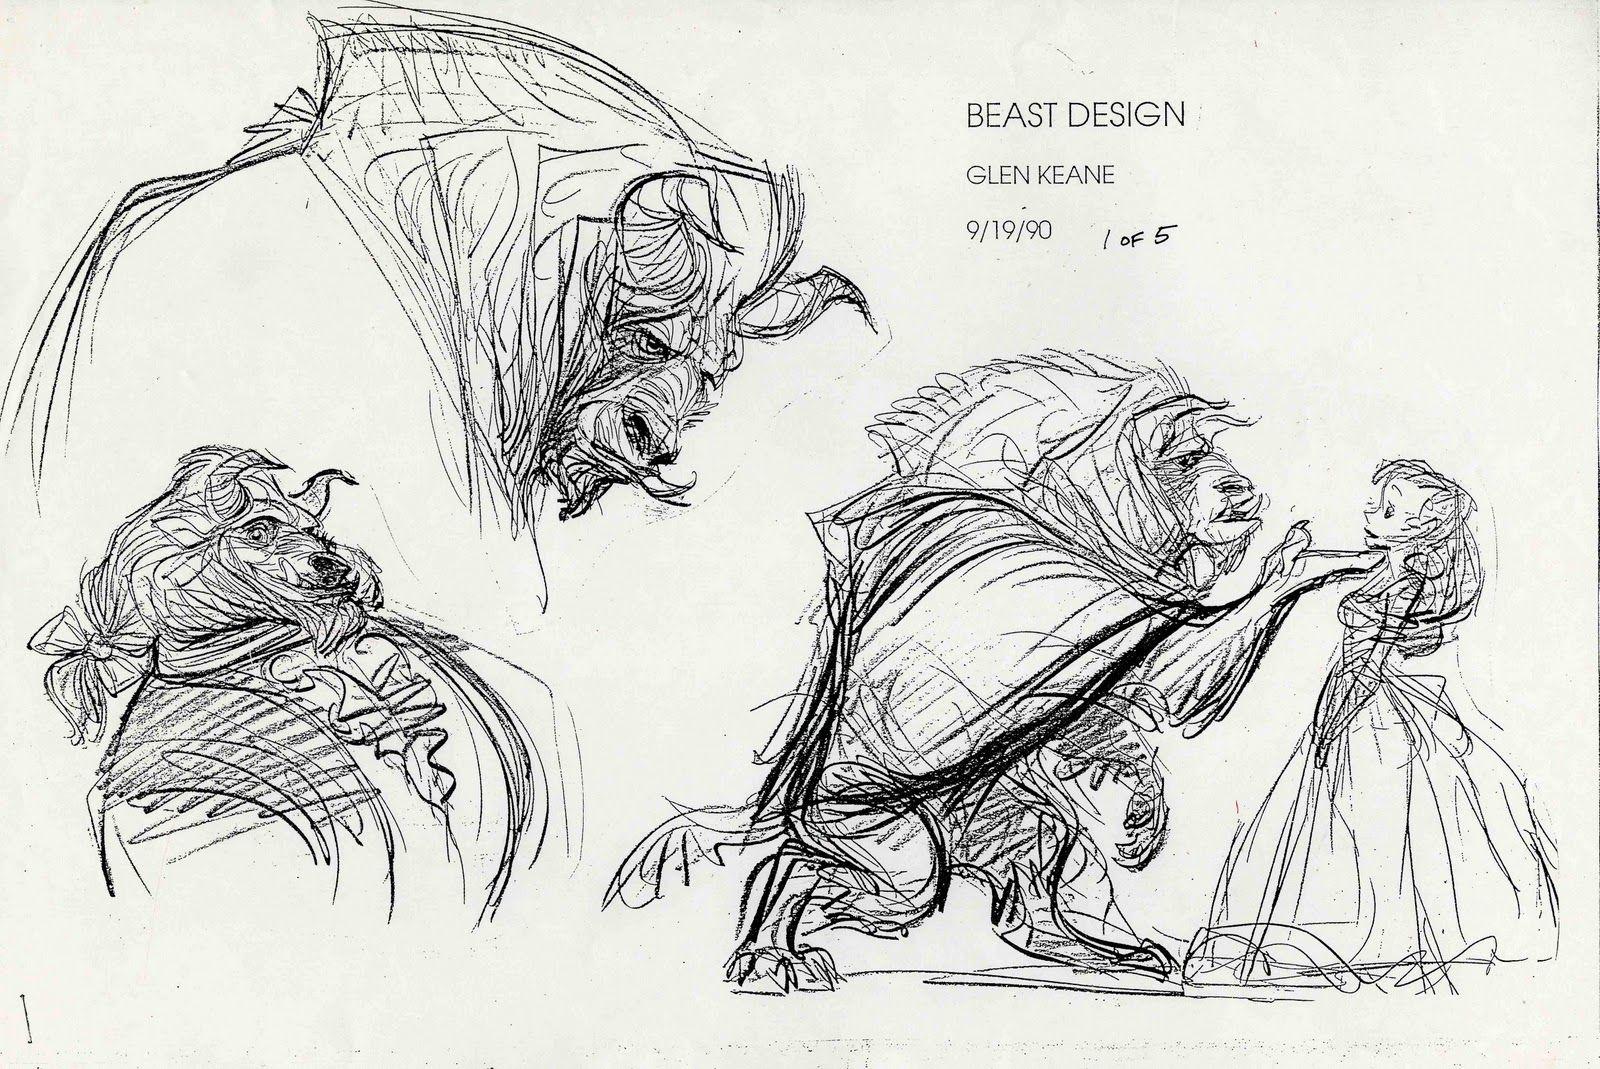 Beauty and the Beast - Beast design by Glen Keane